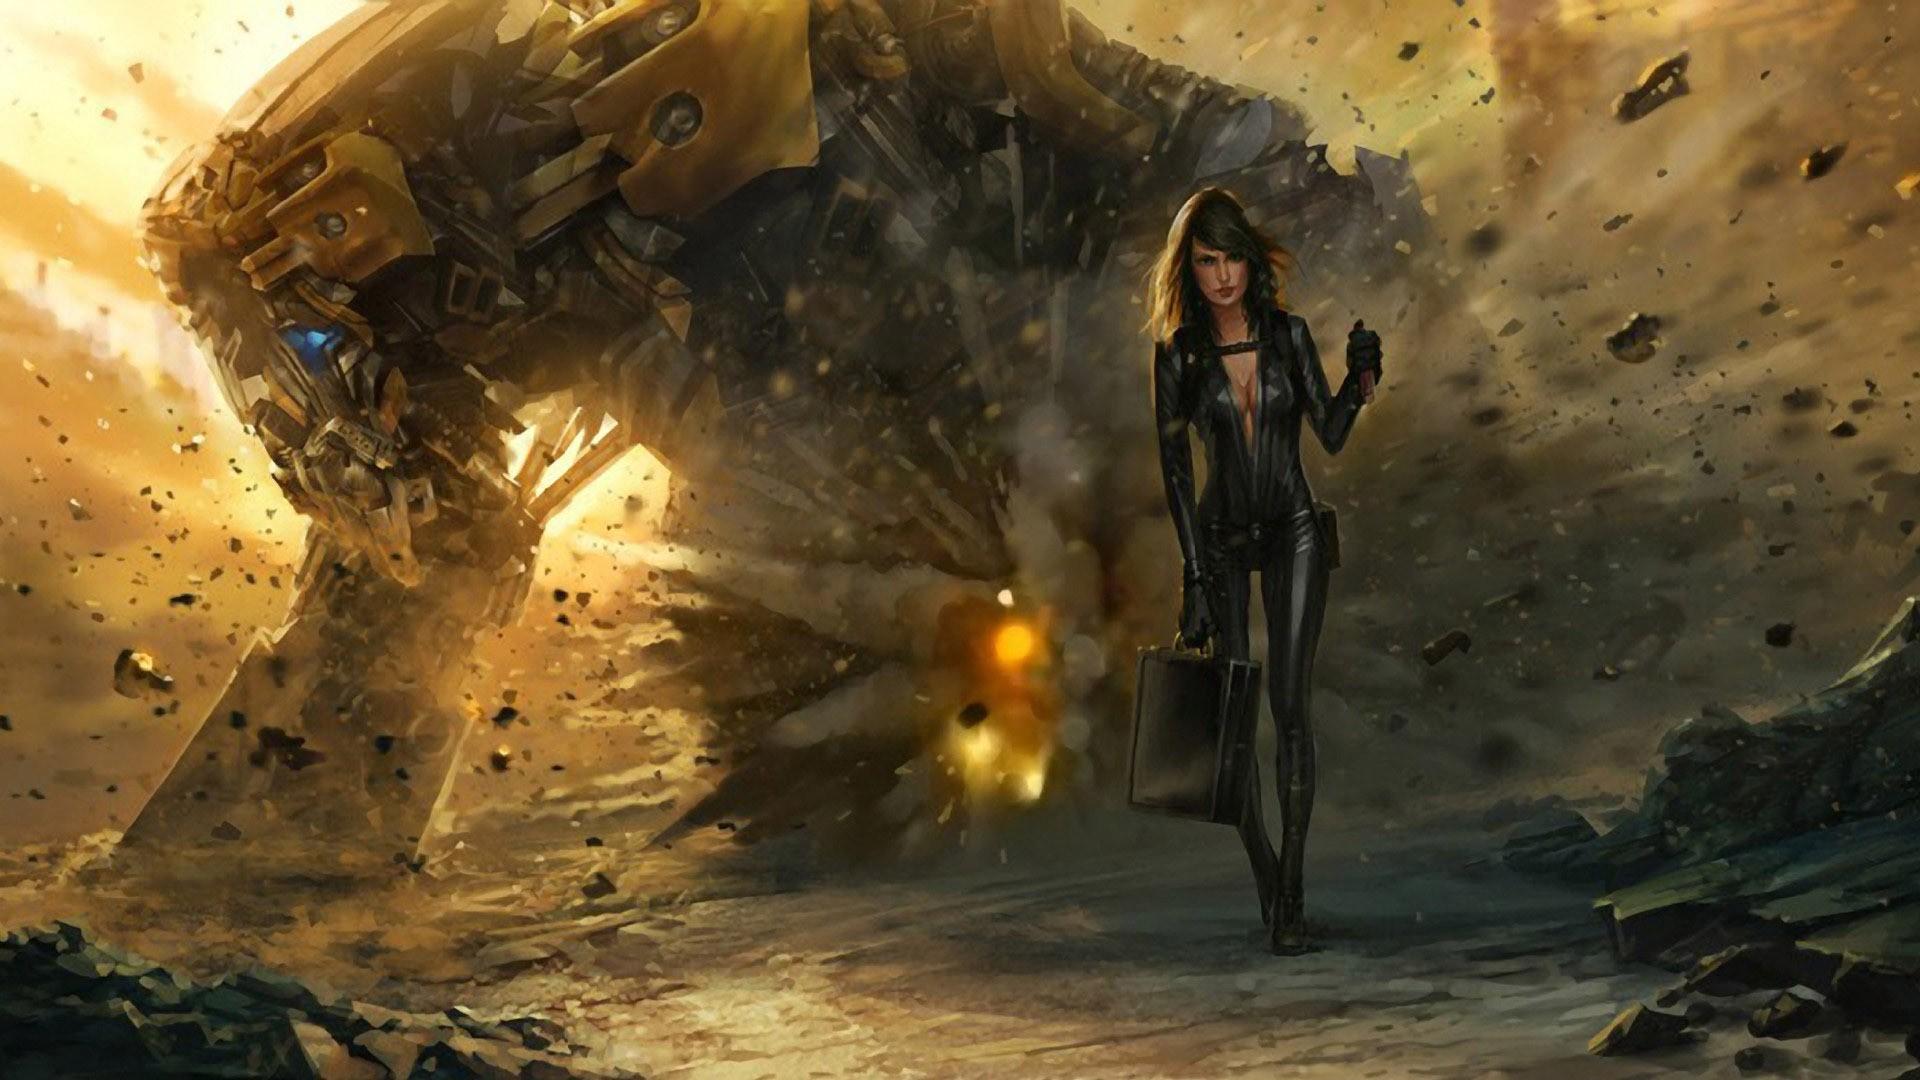 women, Robot, Destruction, Concept Art, Fantasy Art, Bodysuit, Mech